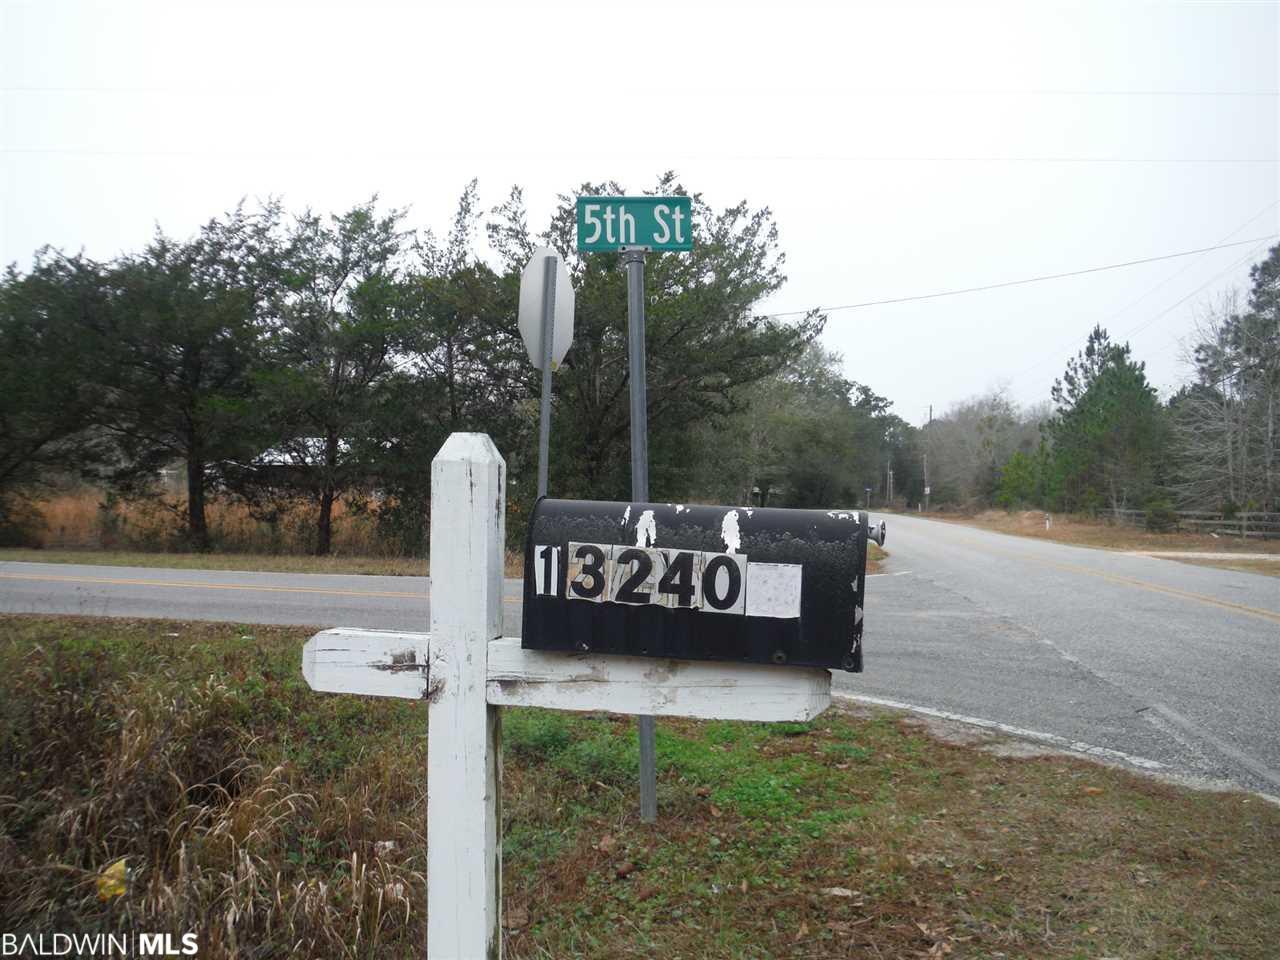 13240 Boykin Blvd, Lillian, AL 36549